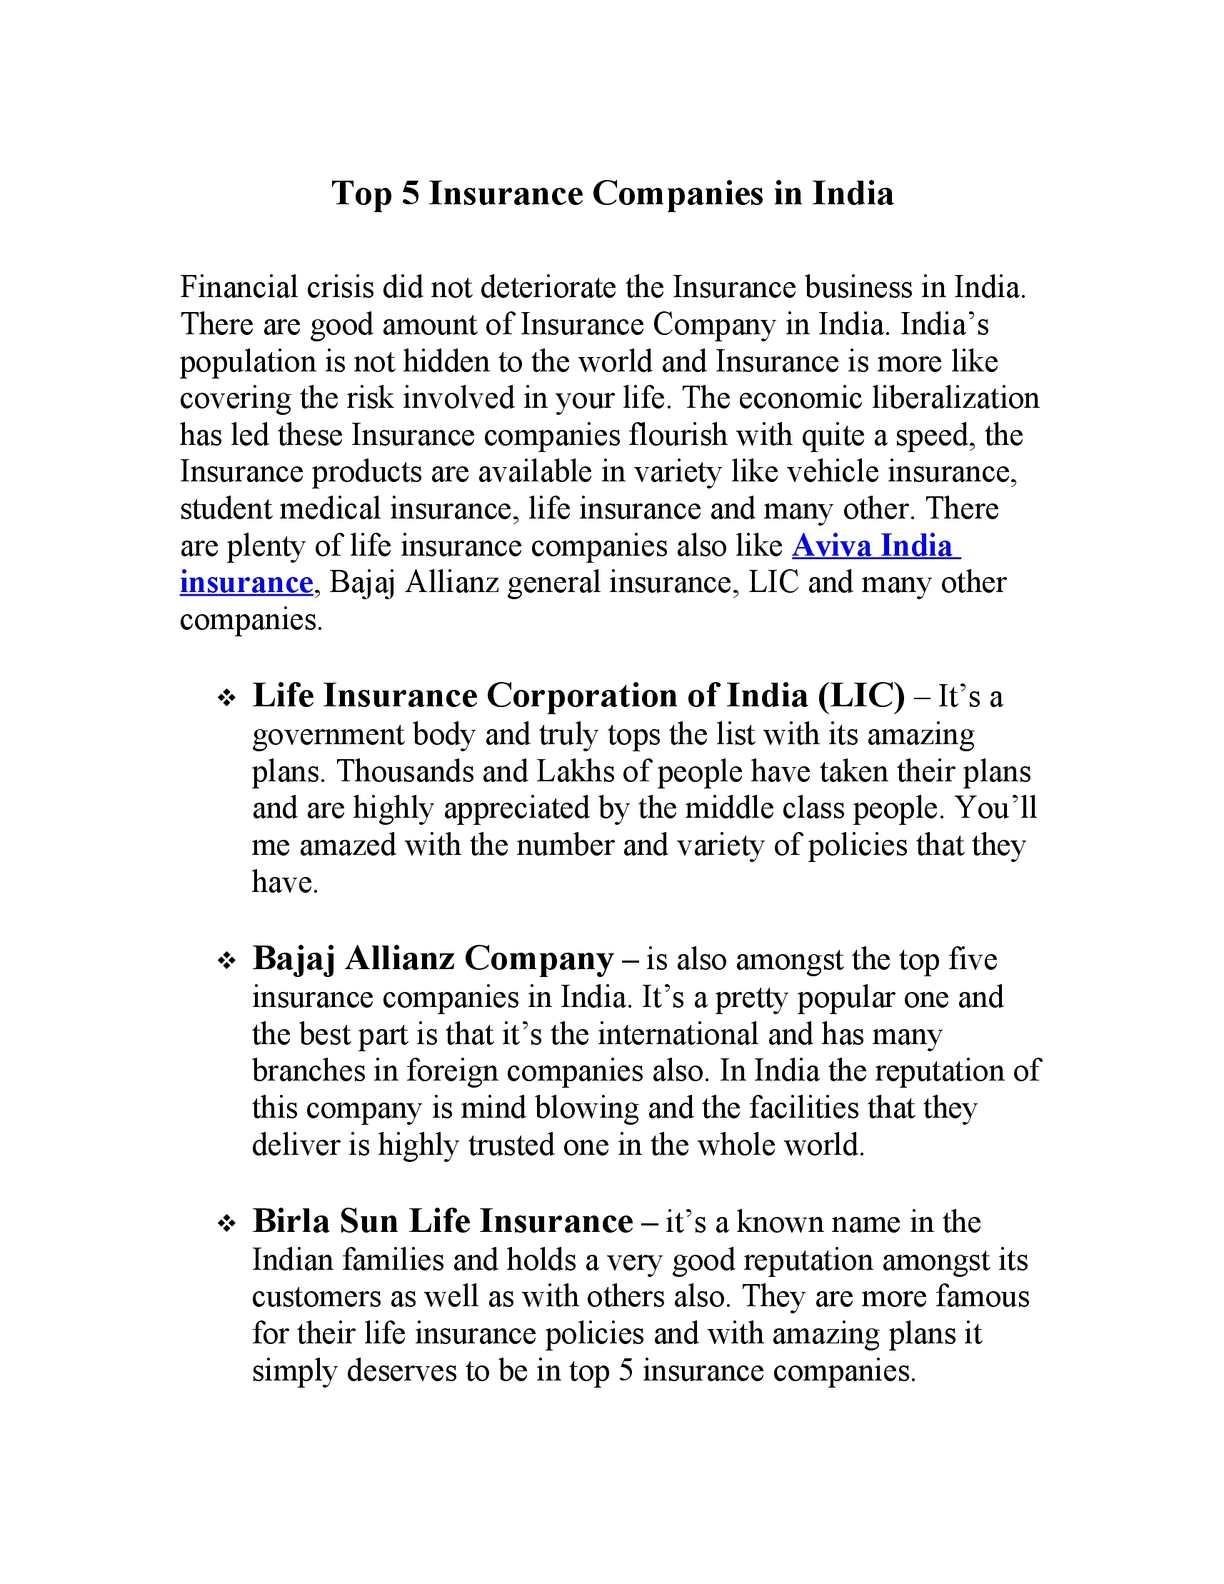 Top Ten Life Insurance Companies >> Calameo Top 5 Insurance Companies In India